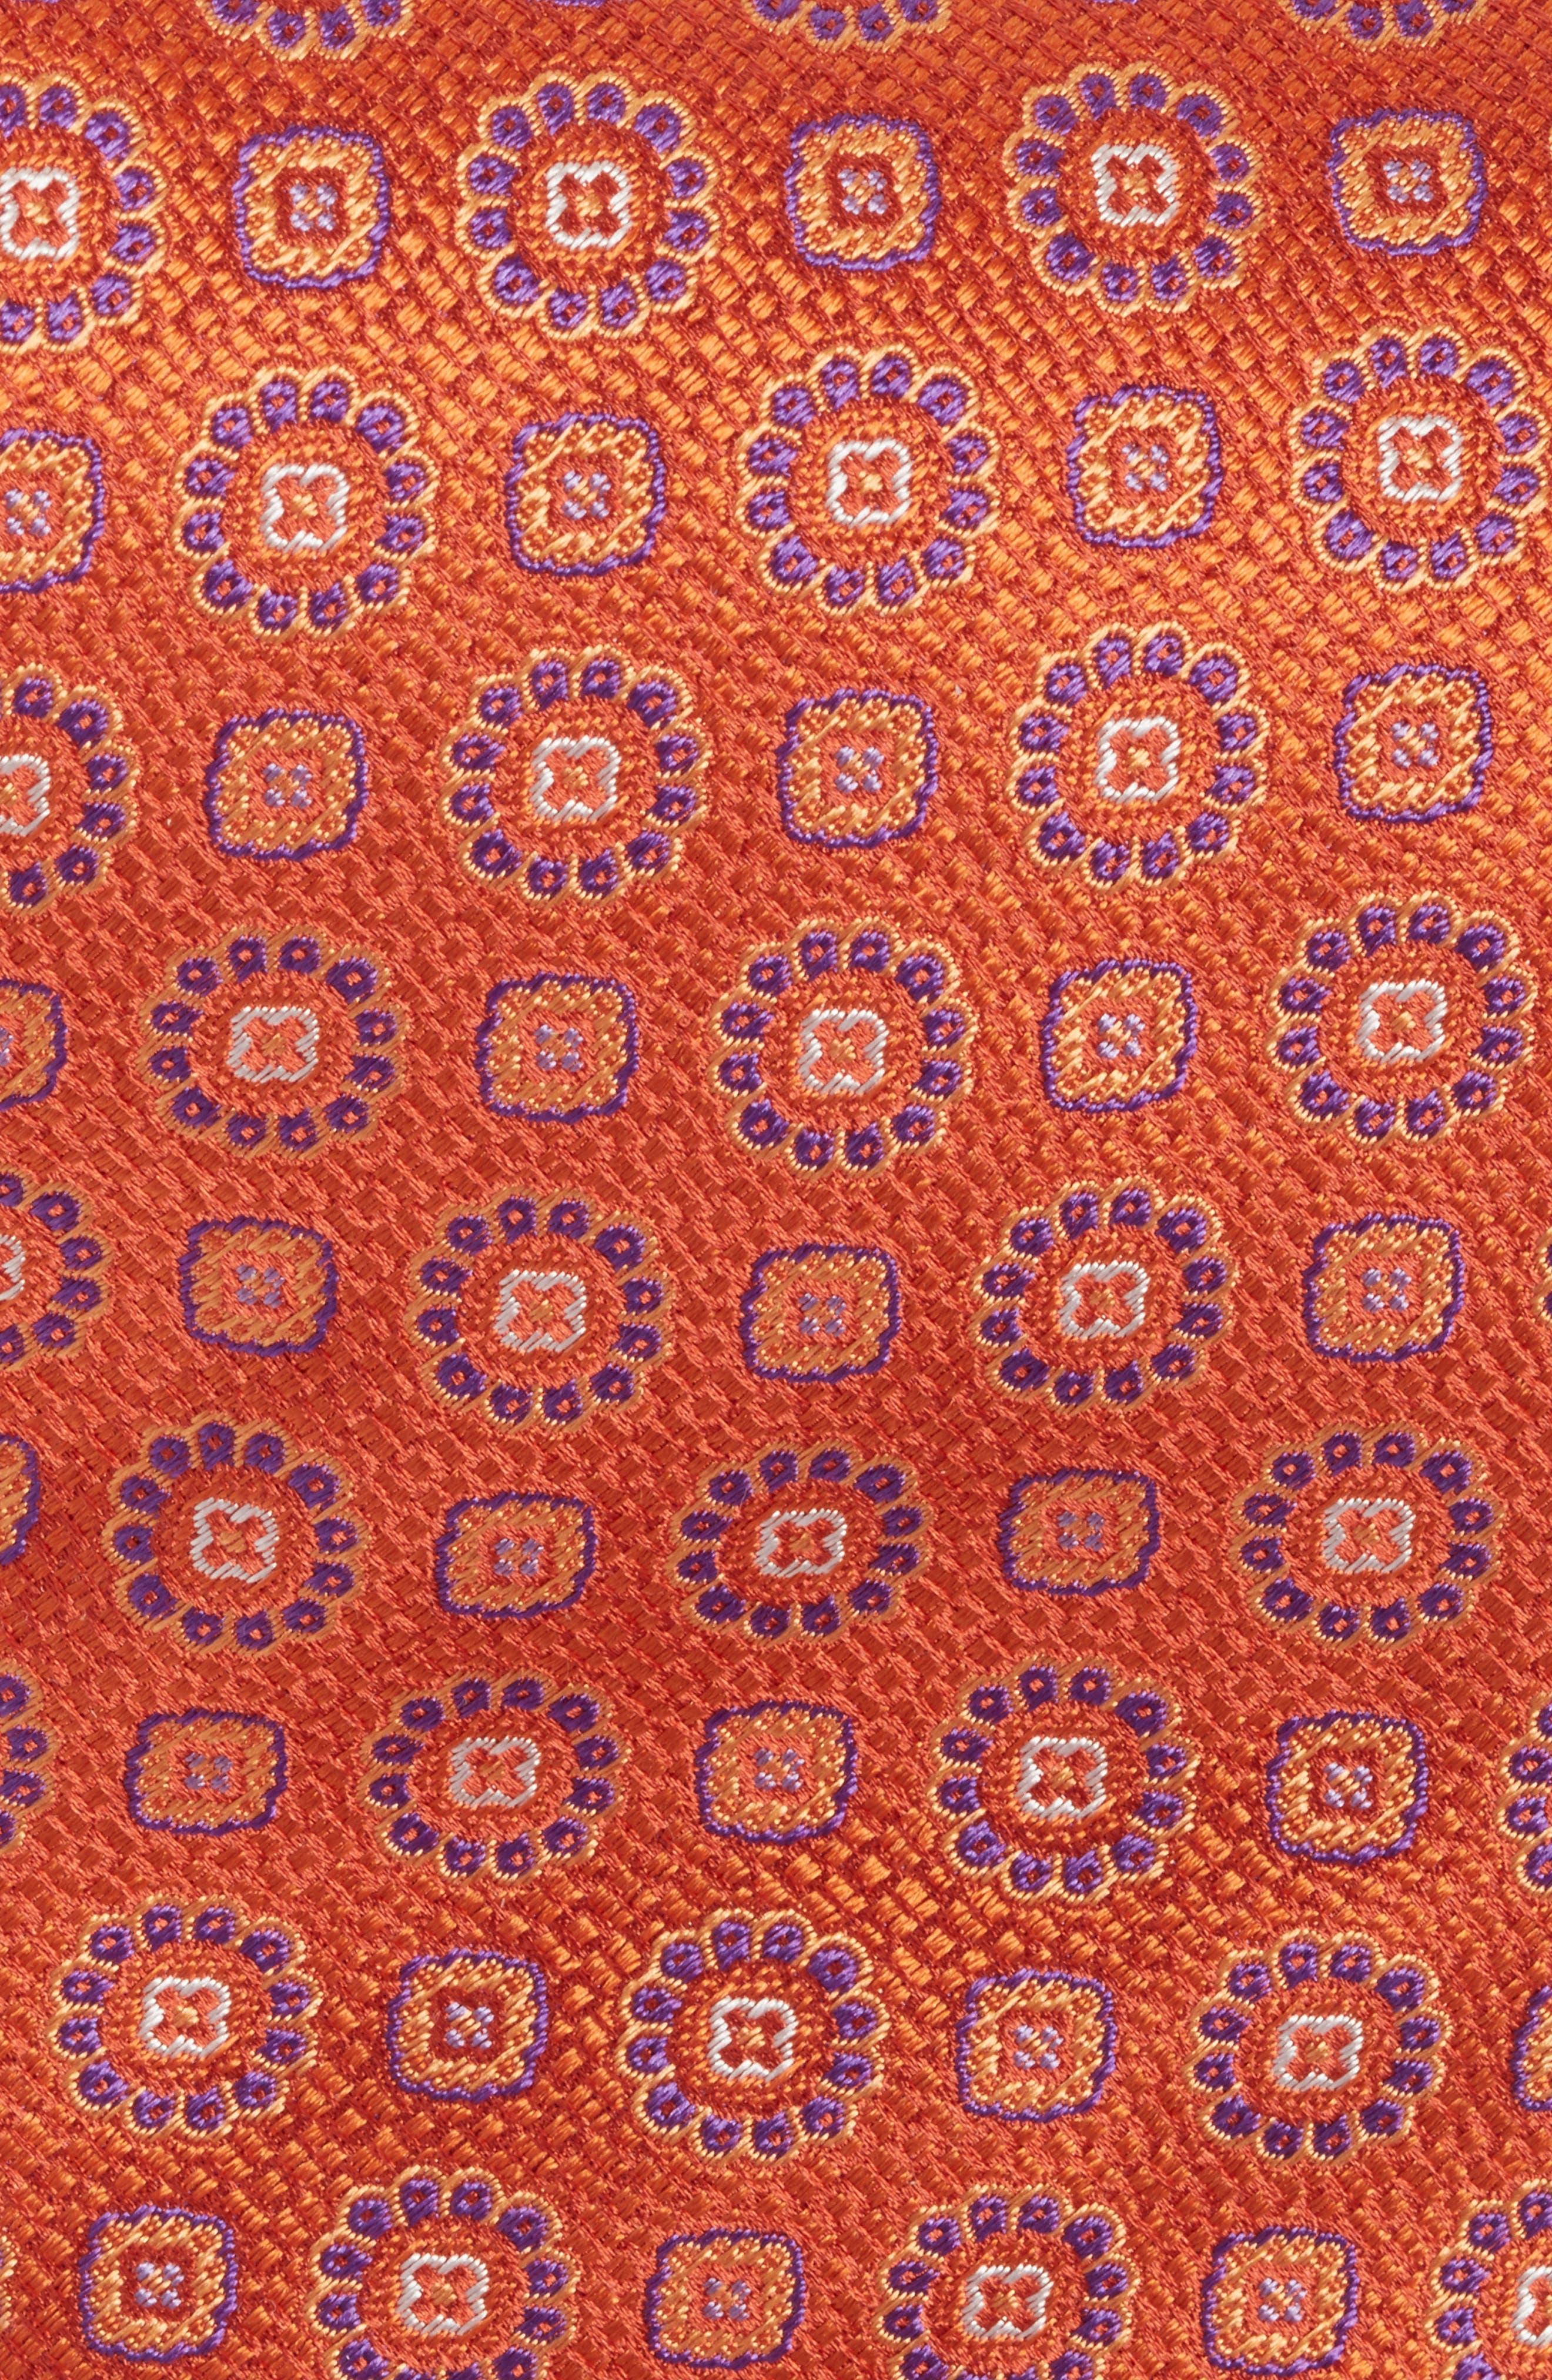 Medallion Silk Tie,                             Alternate thumbnail 2, color,                             Melon